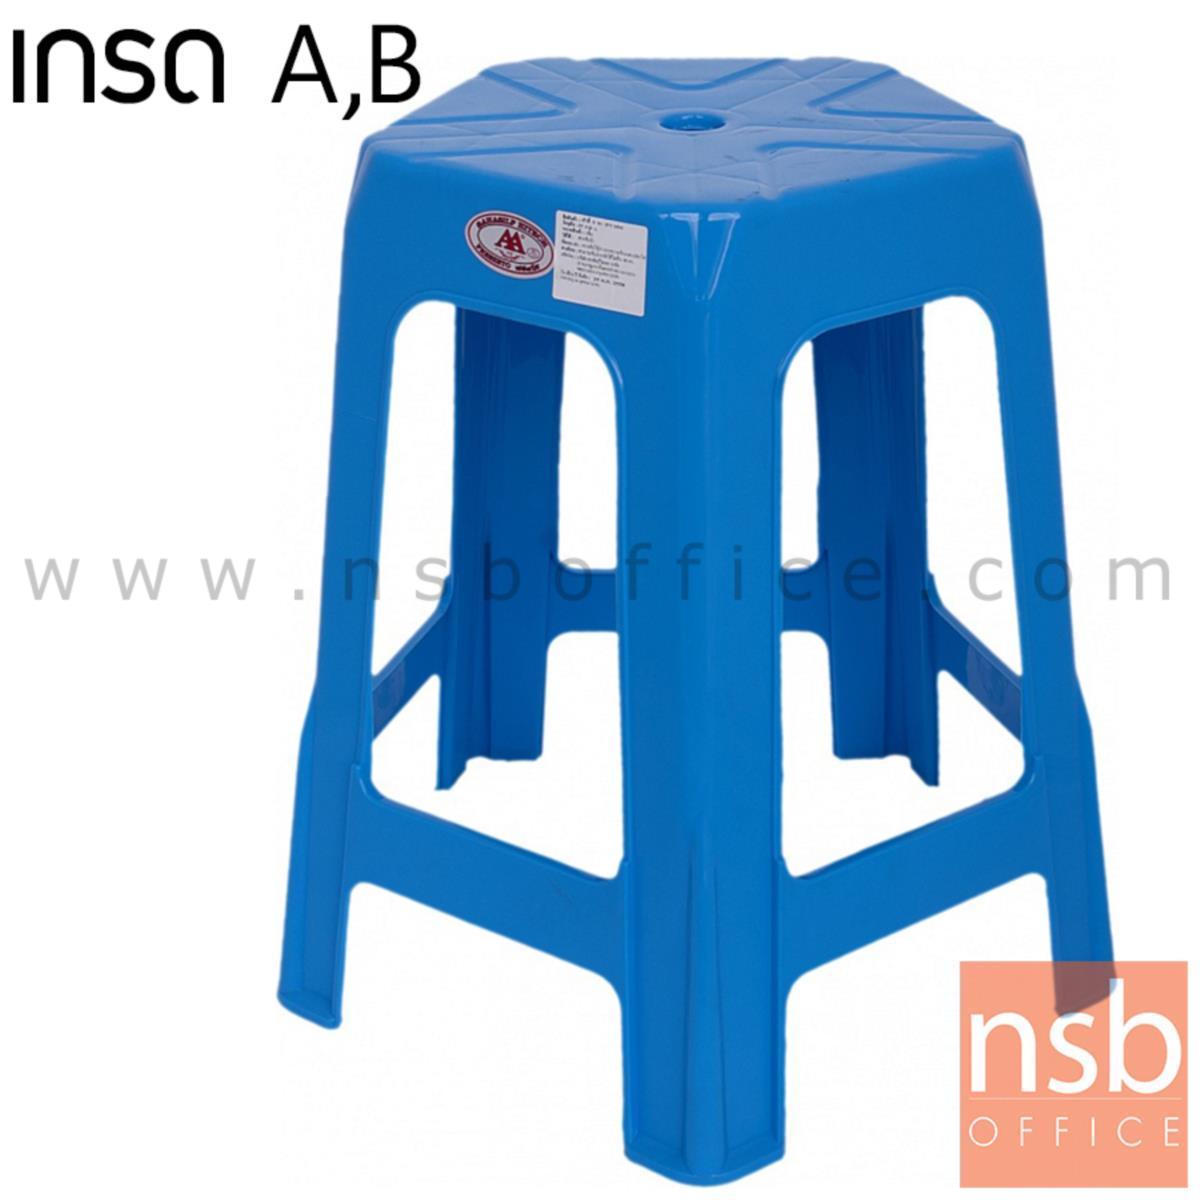 B10A058:เก้าอี้พลาสติก 5 ขา รุ่น FIVESTAR _CHAIR ซ้อนทับได้ (ผลิตทั้งเกรด A และ B)